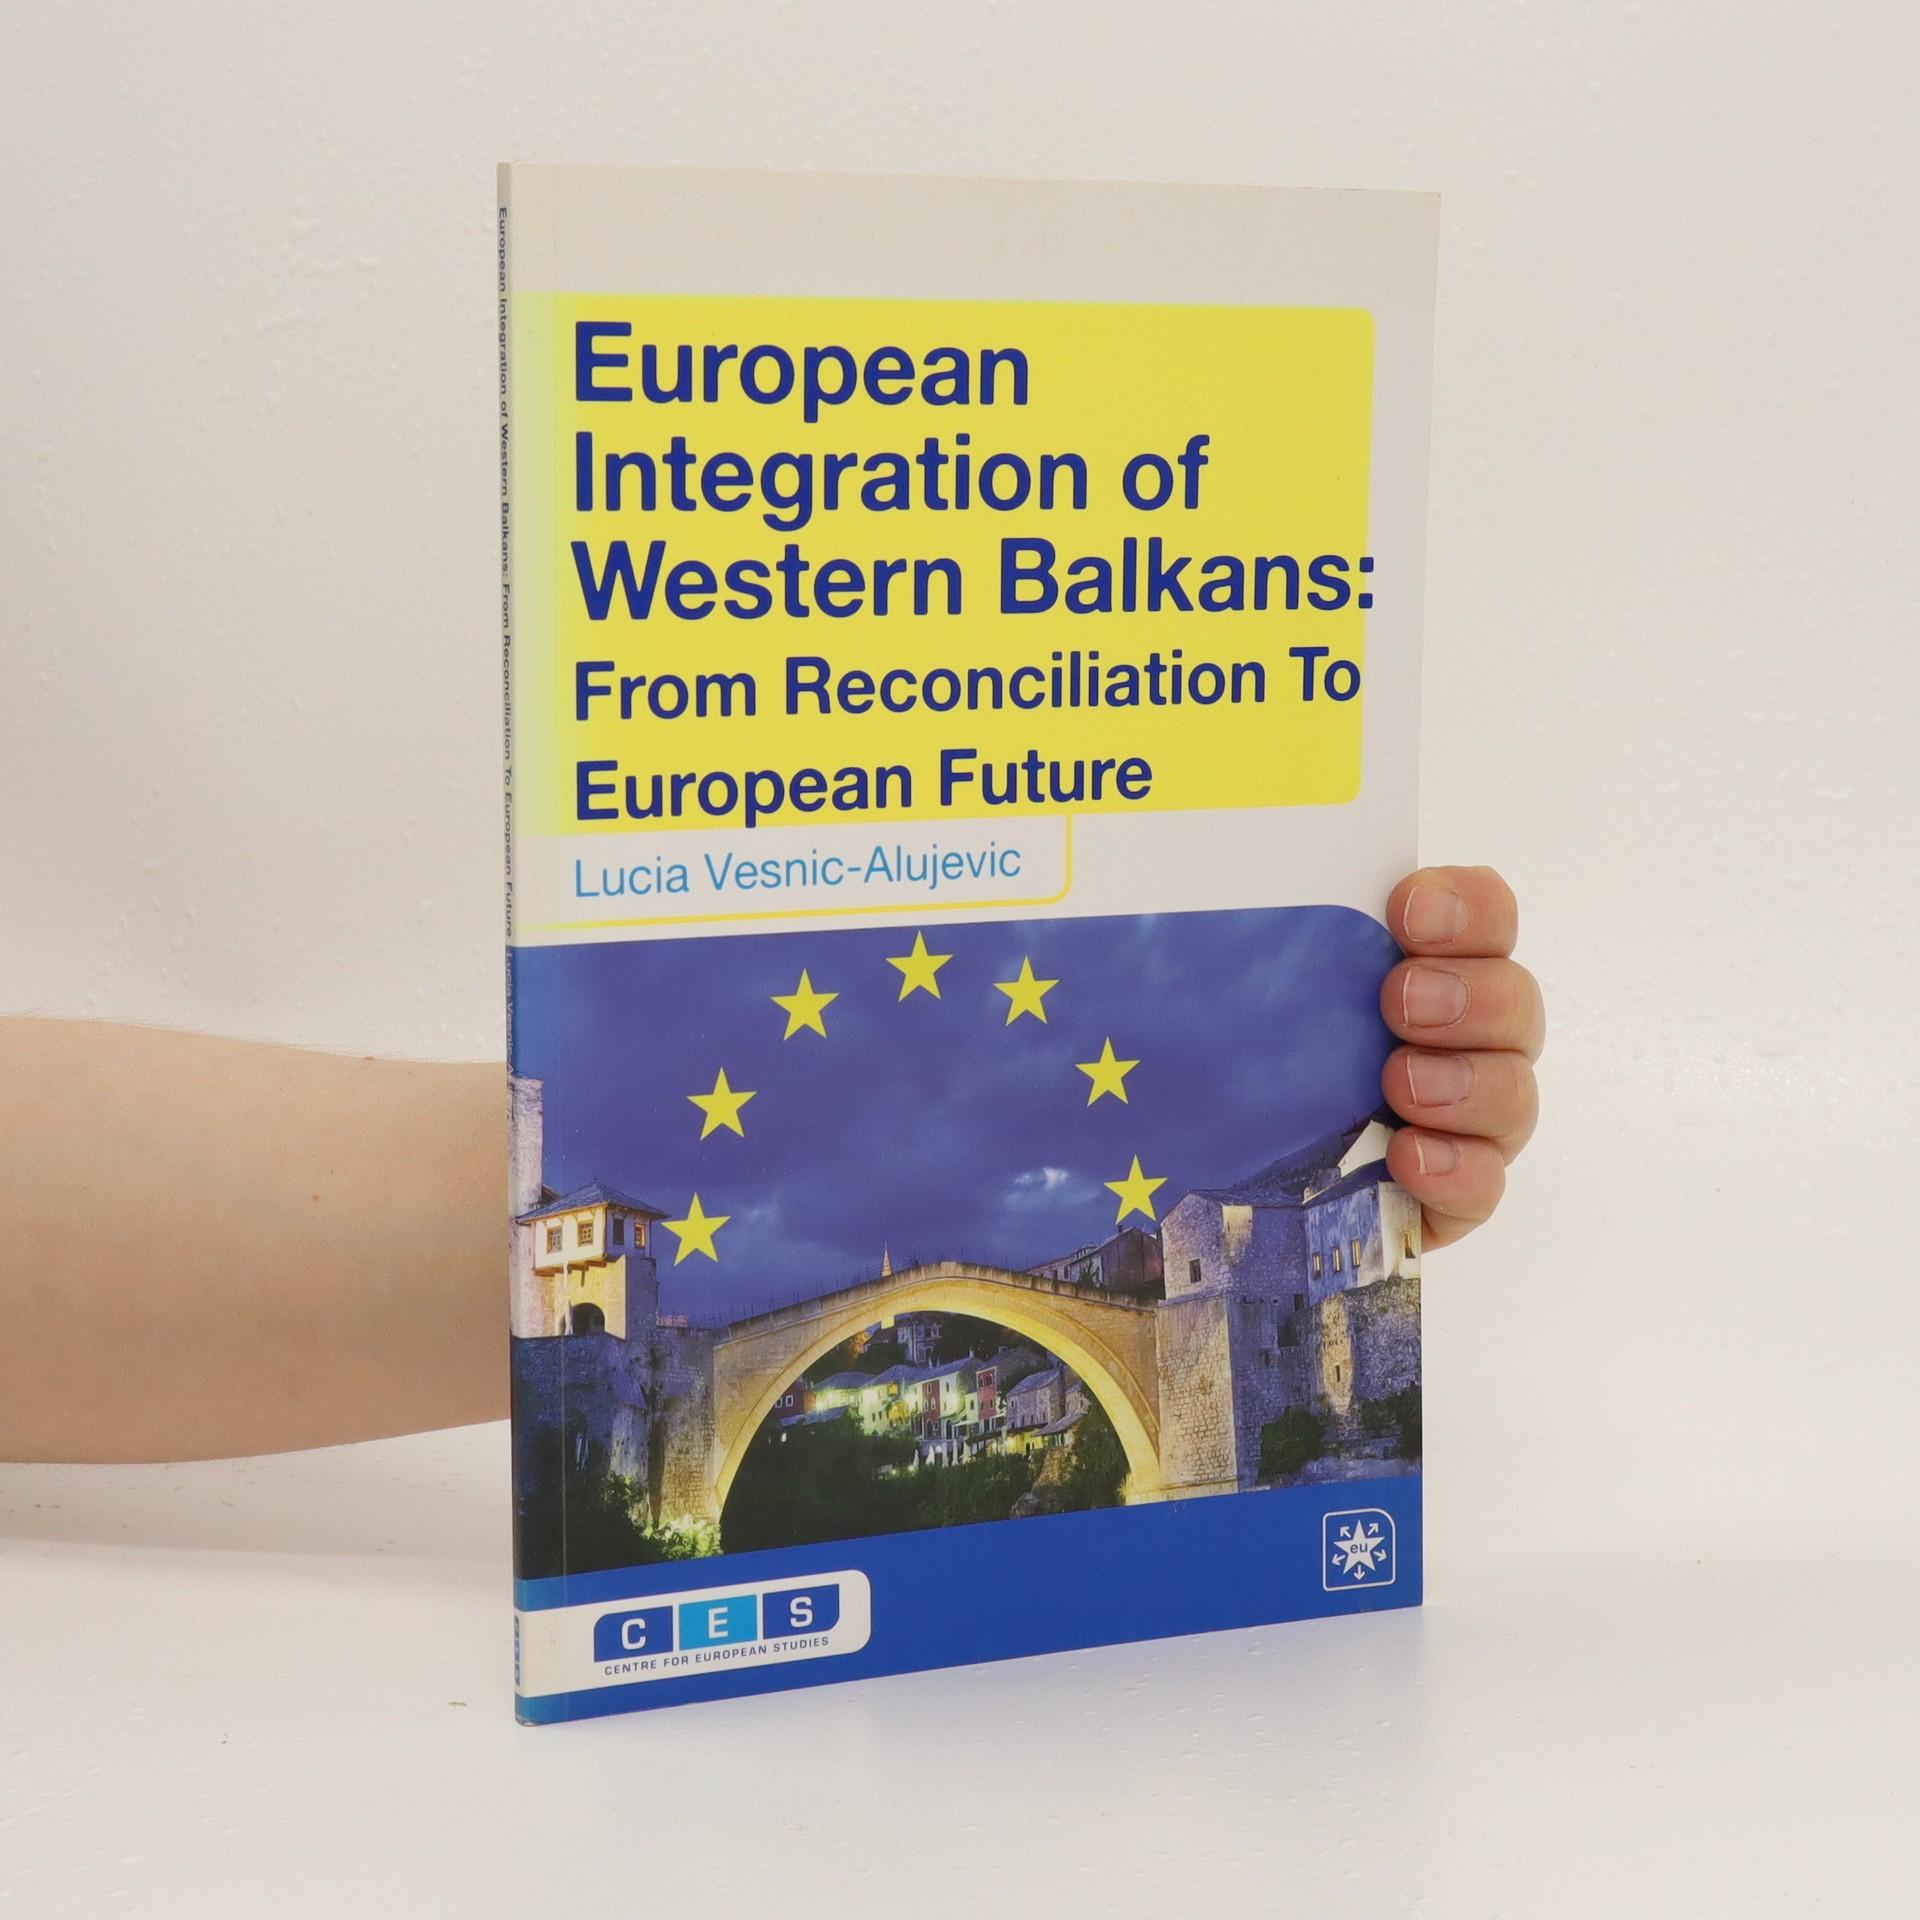 antikvární kniha European Integration of Western Balkans, neuveden